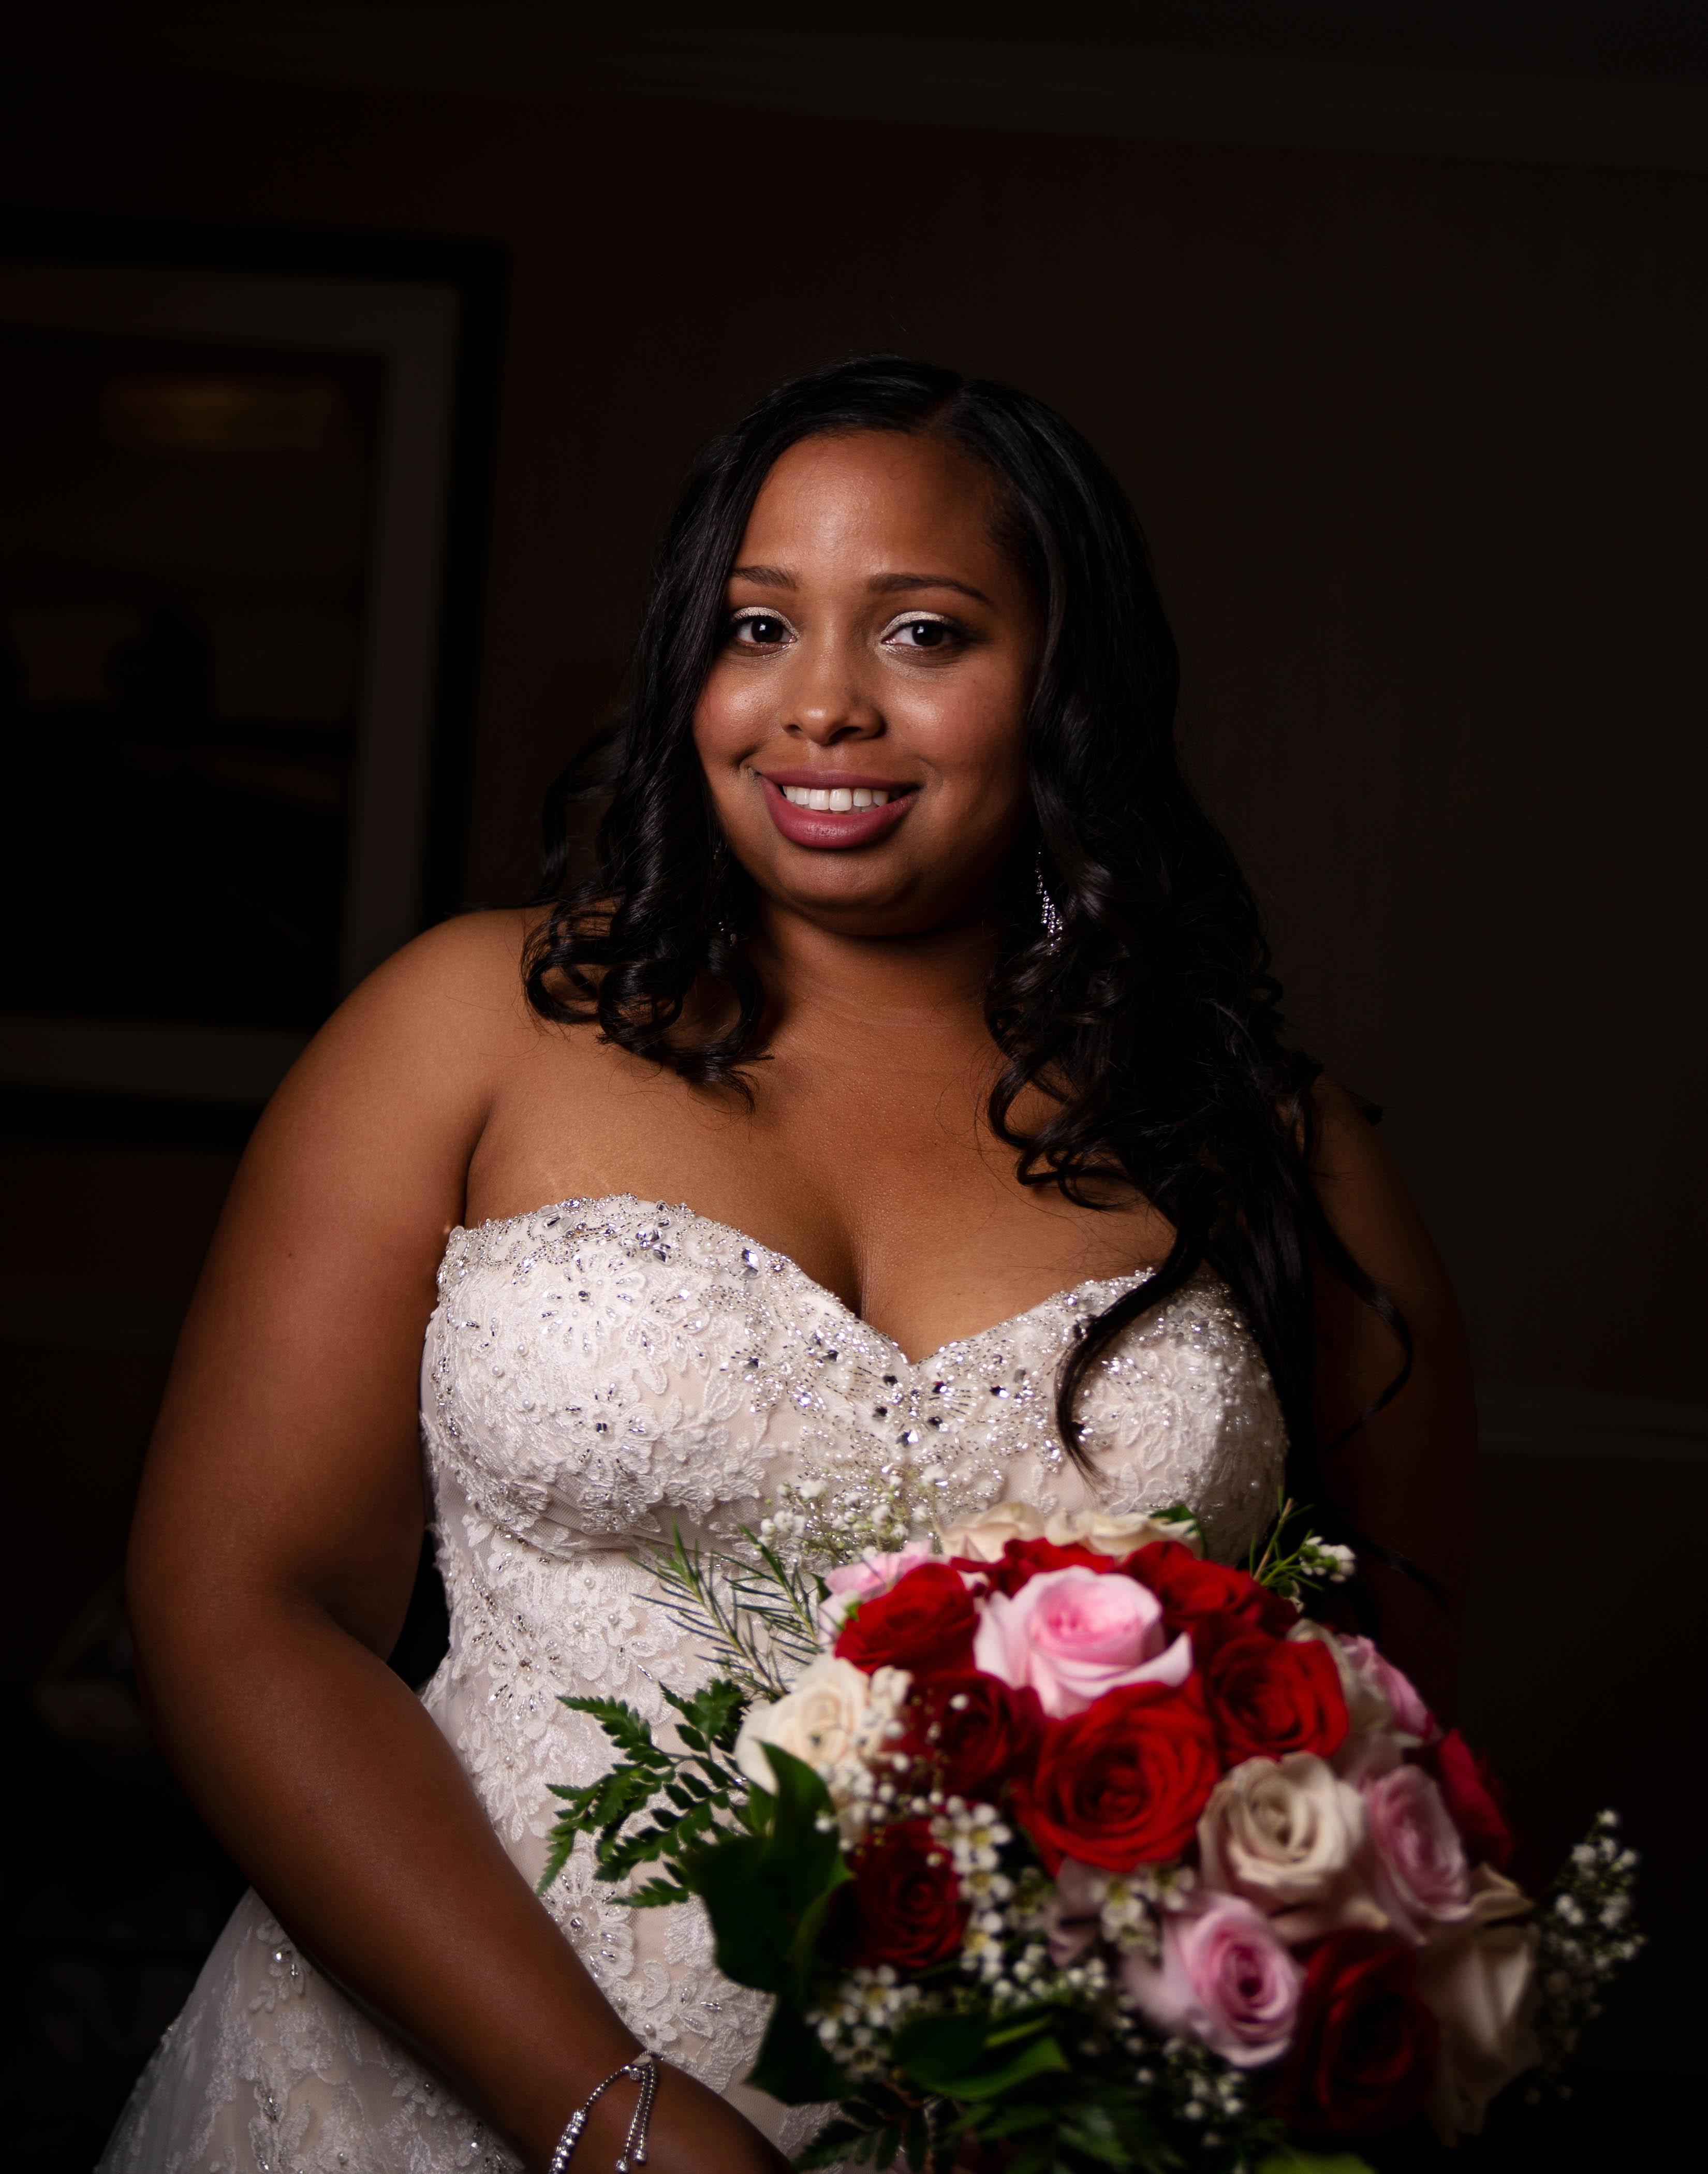 CPH_High-Res-Gaither Wedding2018-149